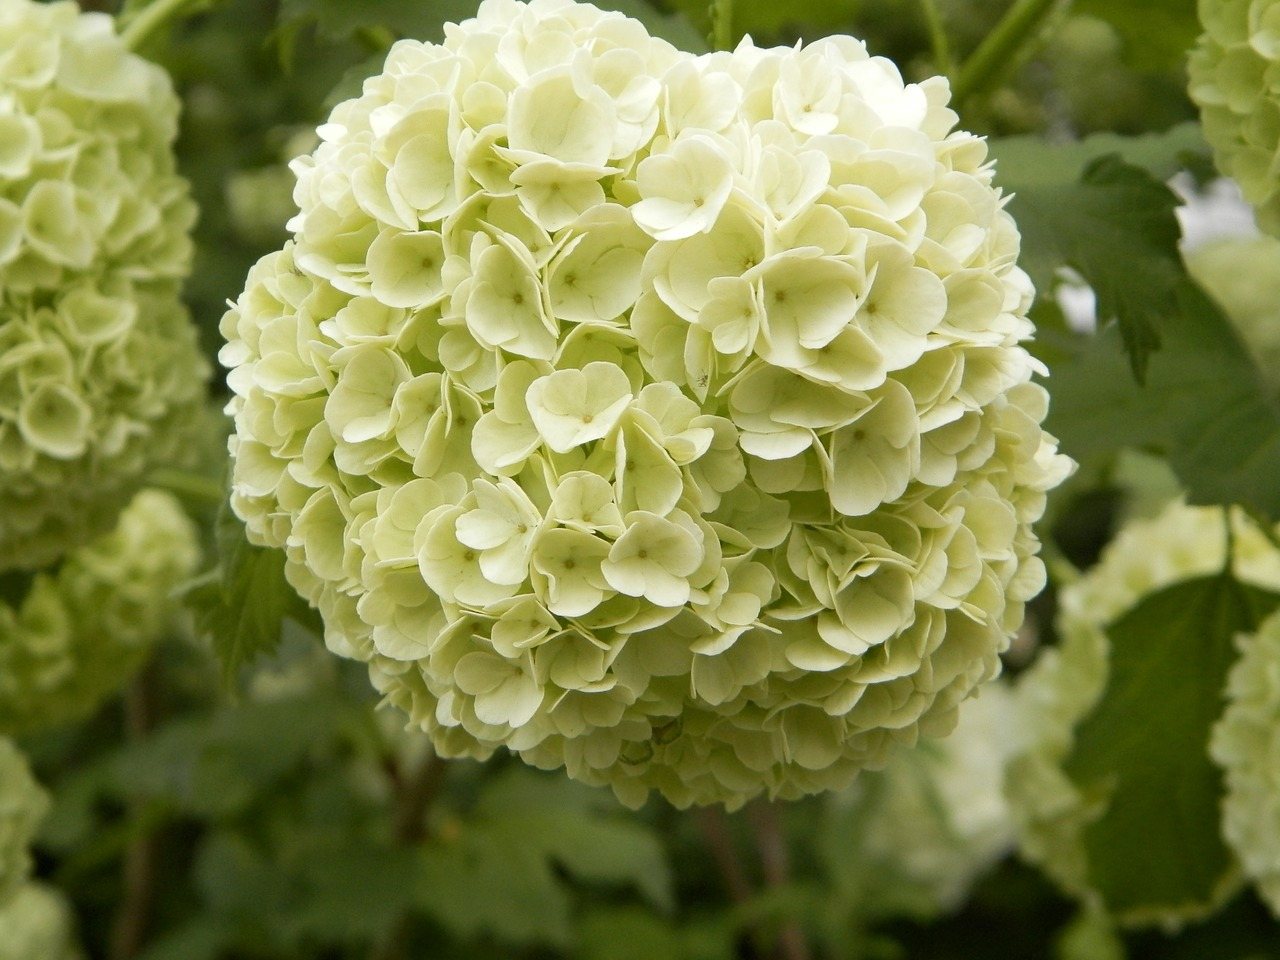 Viburnum - Sneeuwbal  Hoogte: 50 - 70 cm  Kleur: Wit  Wintergroen: Ja  Bloeiperiode: April - Juni